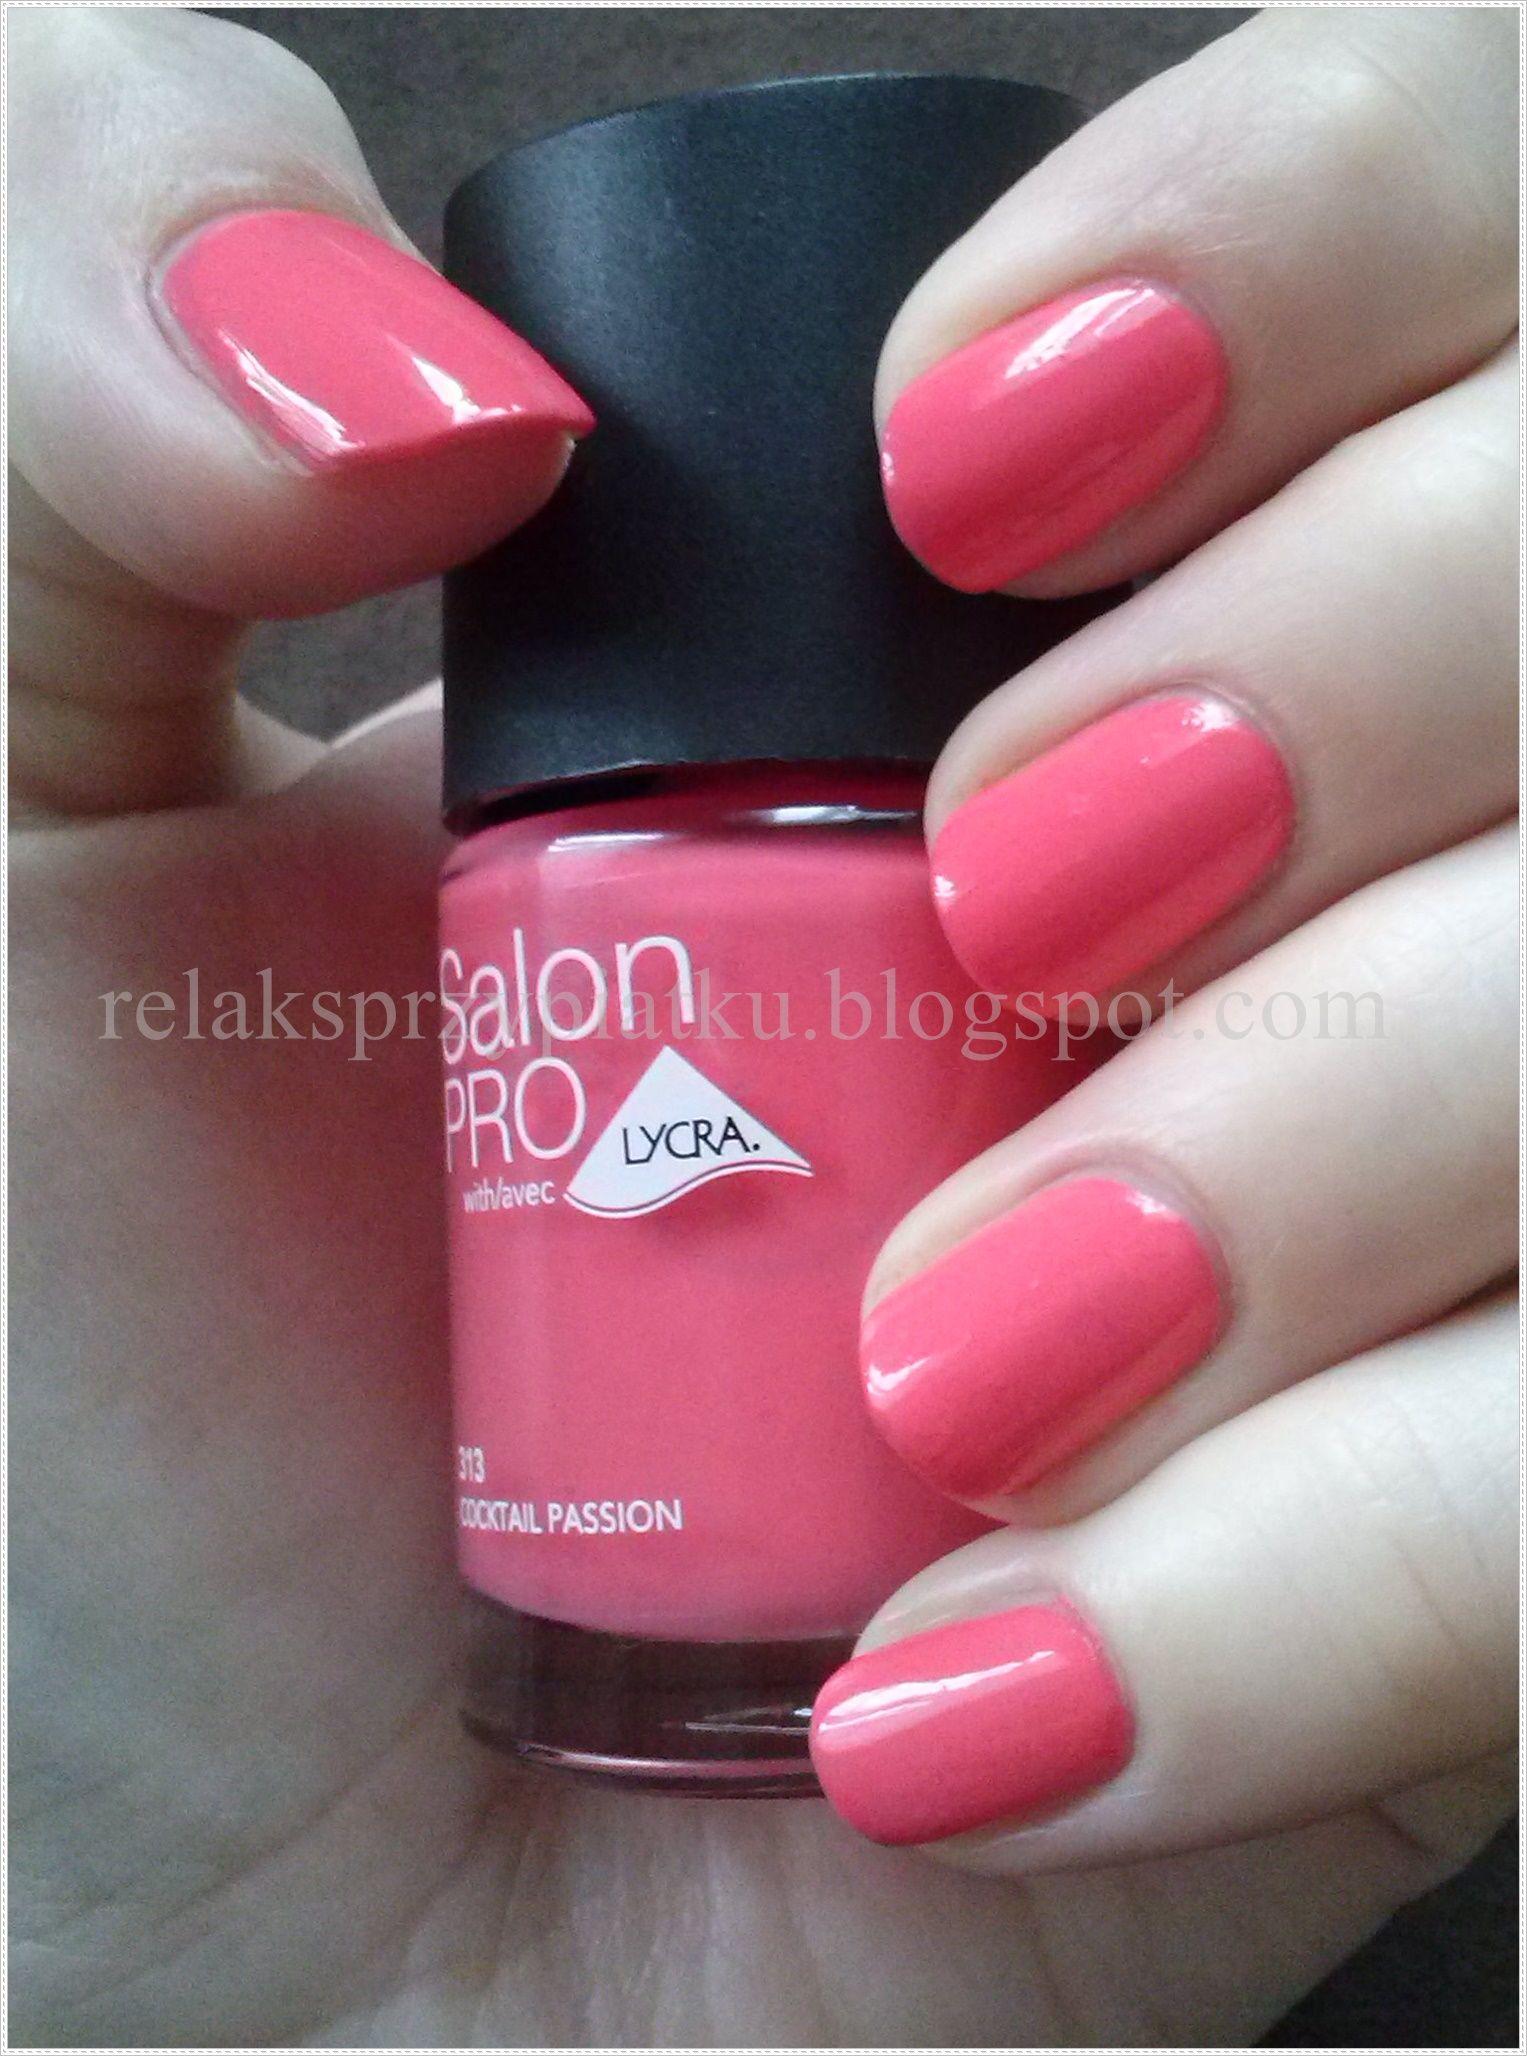 Rimmel Salon Pro Coctail Passion Nail Colors Nails Nail Polish